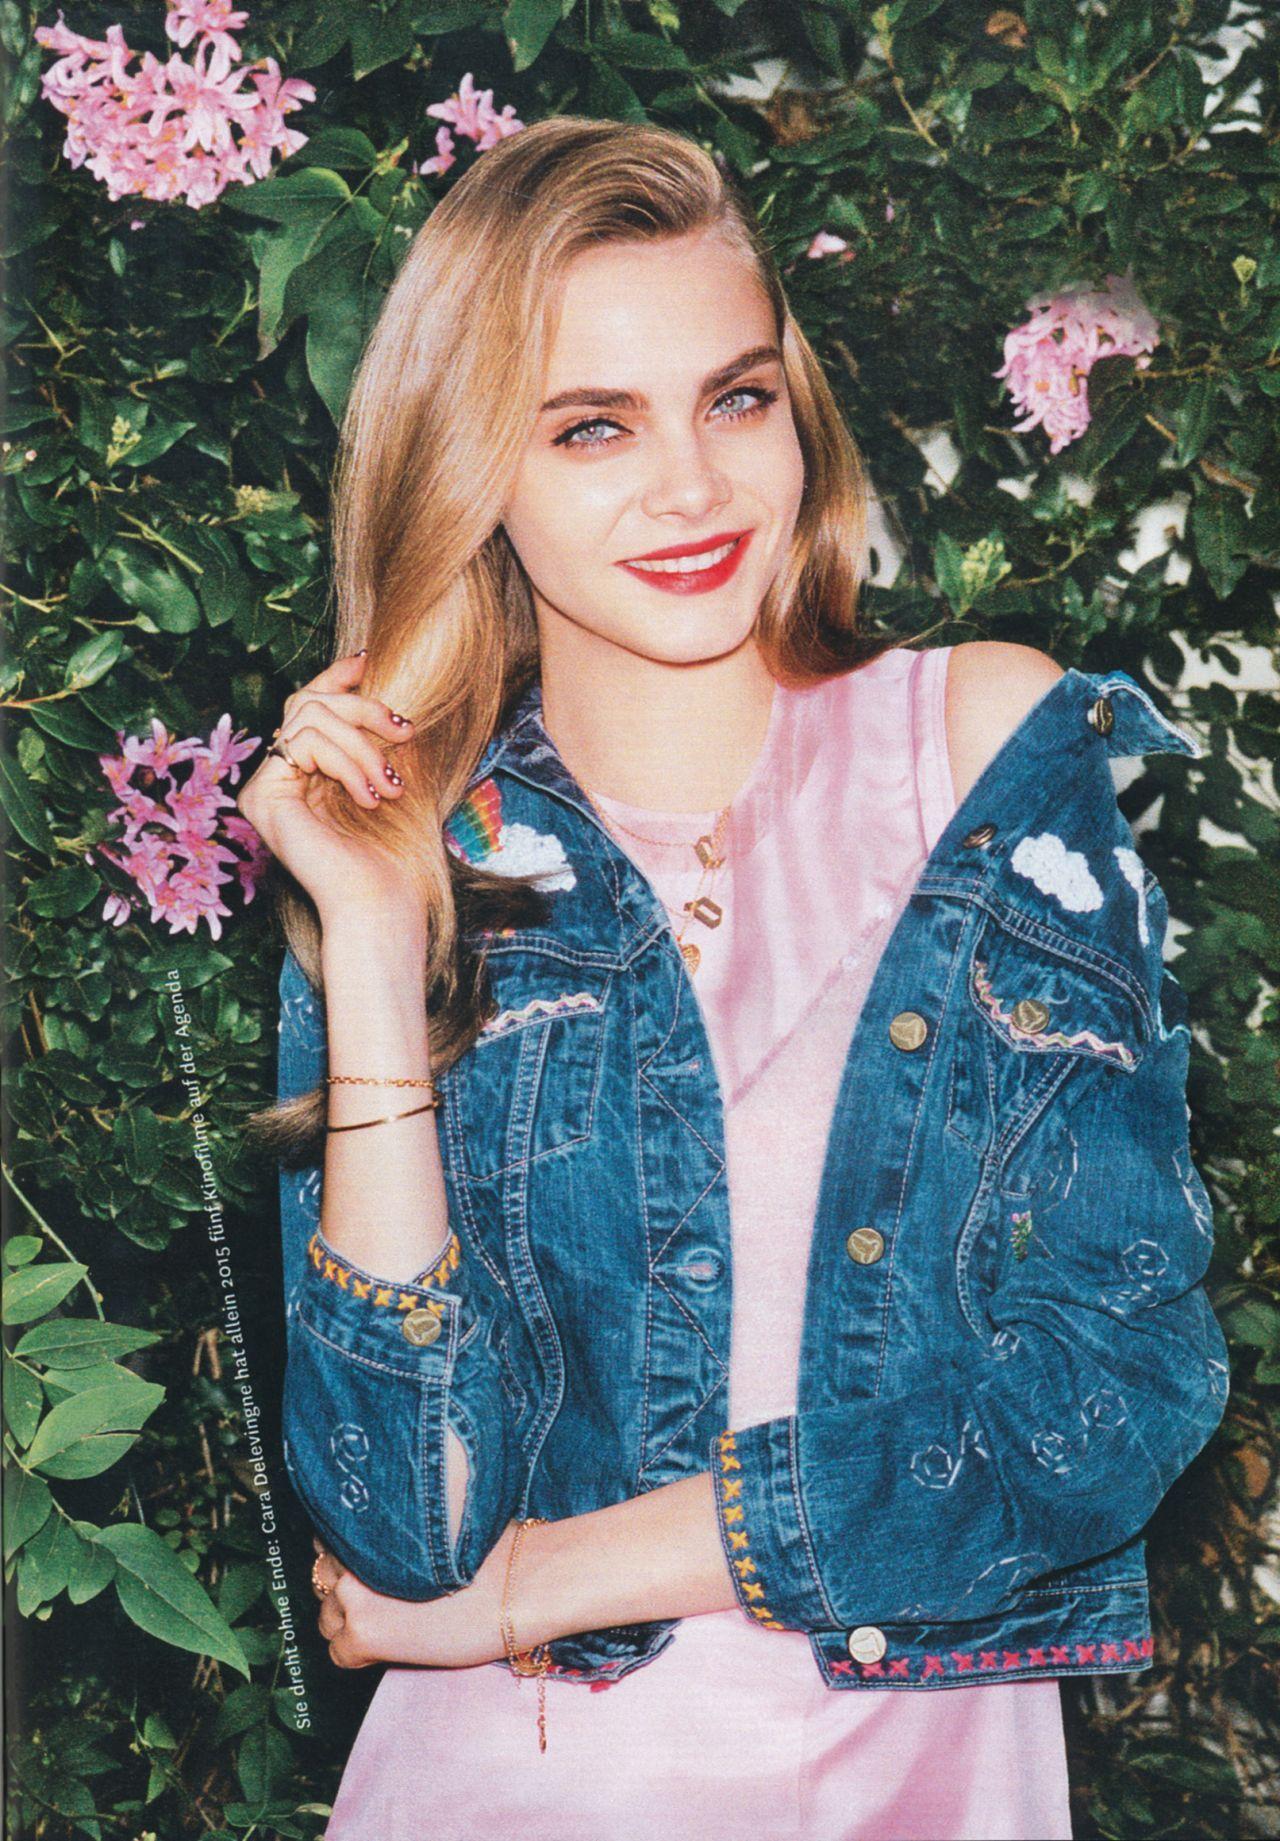 cara-delevingne-glamour-magazine-germany-august-2015-issue_1.jpg (1280×1841)